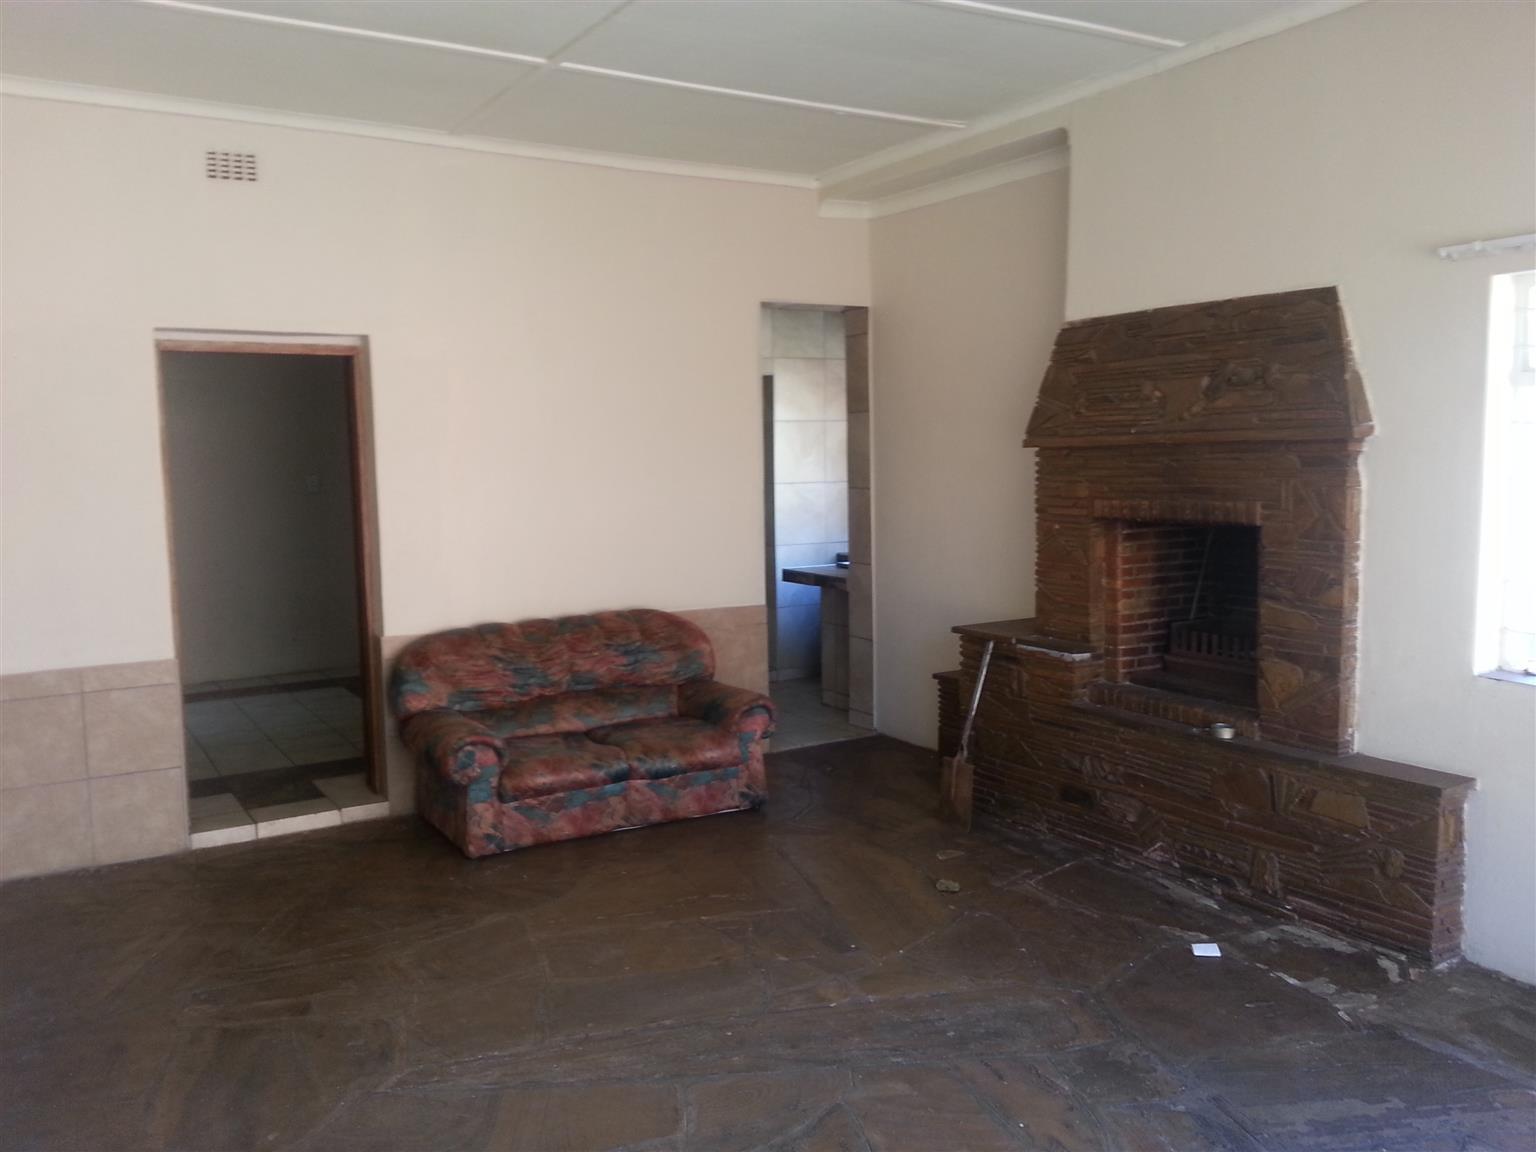 Koos de la Rey str 143 B, Pretoria-Noord